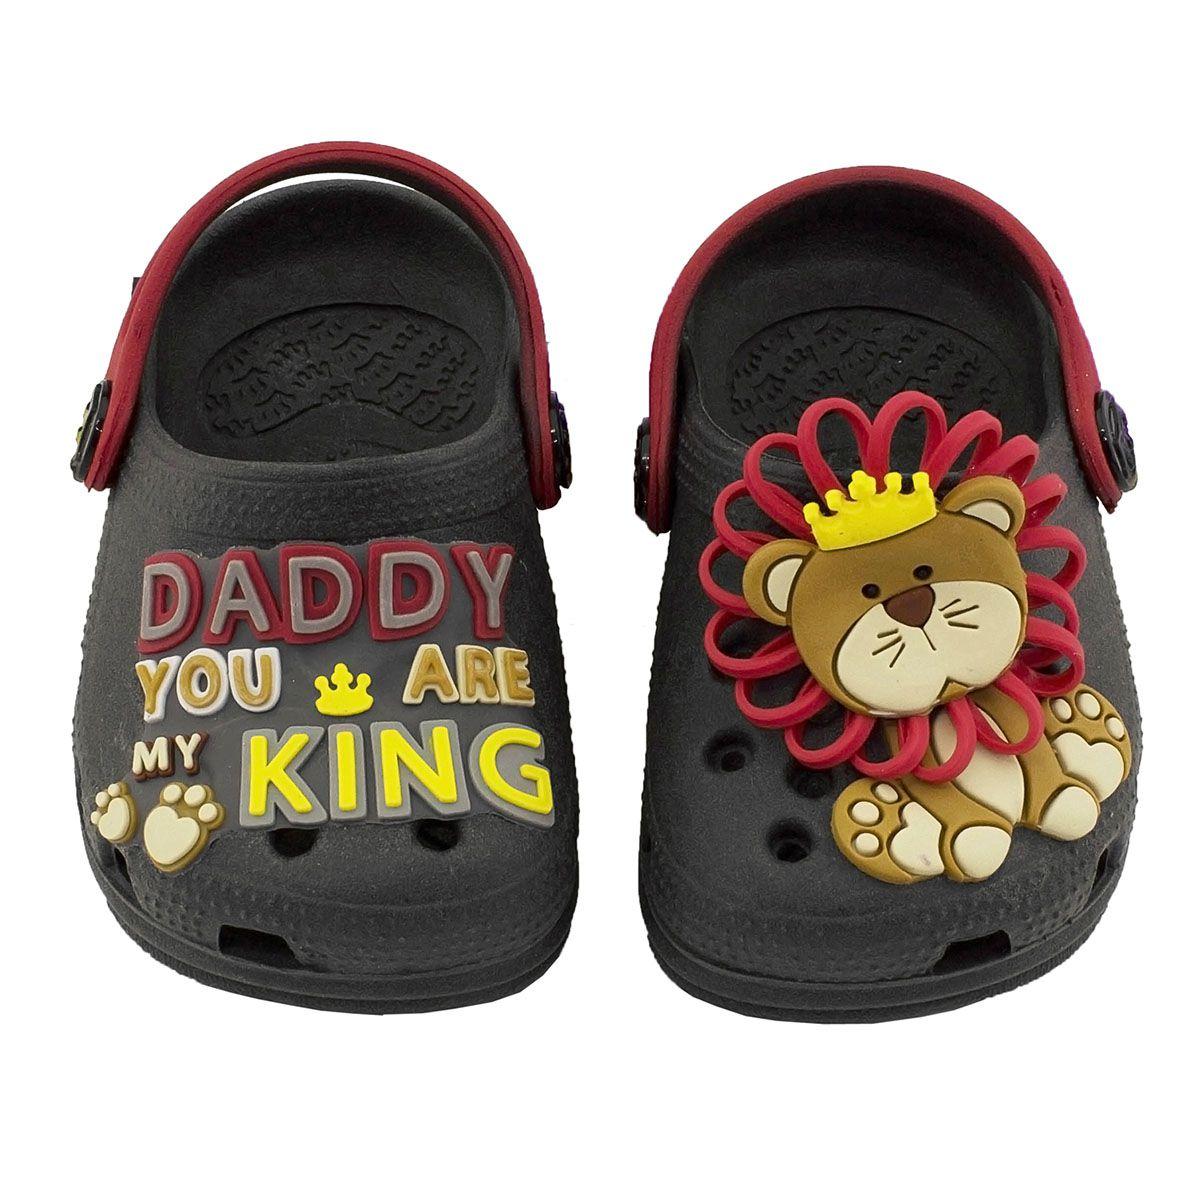 Babuche Baby King Infantil